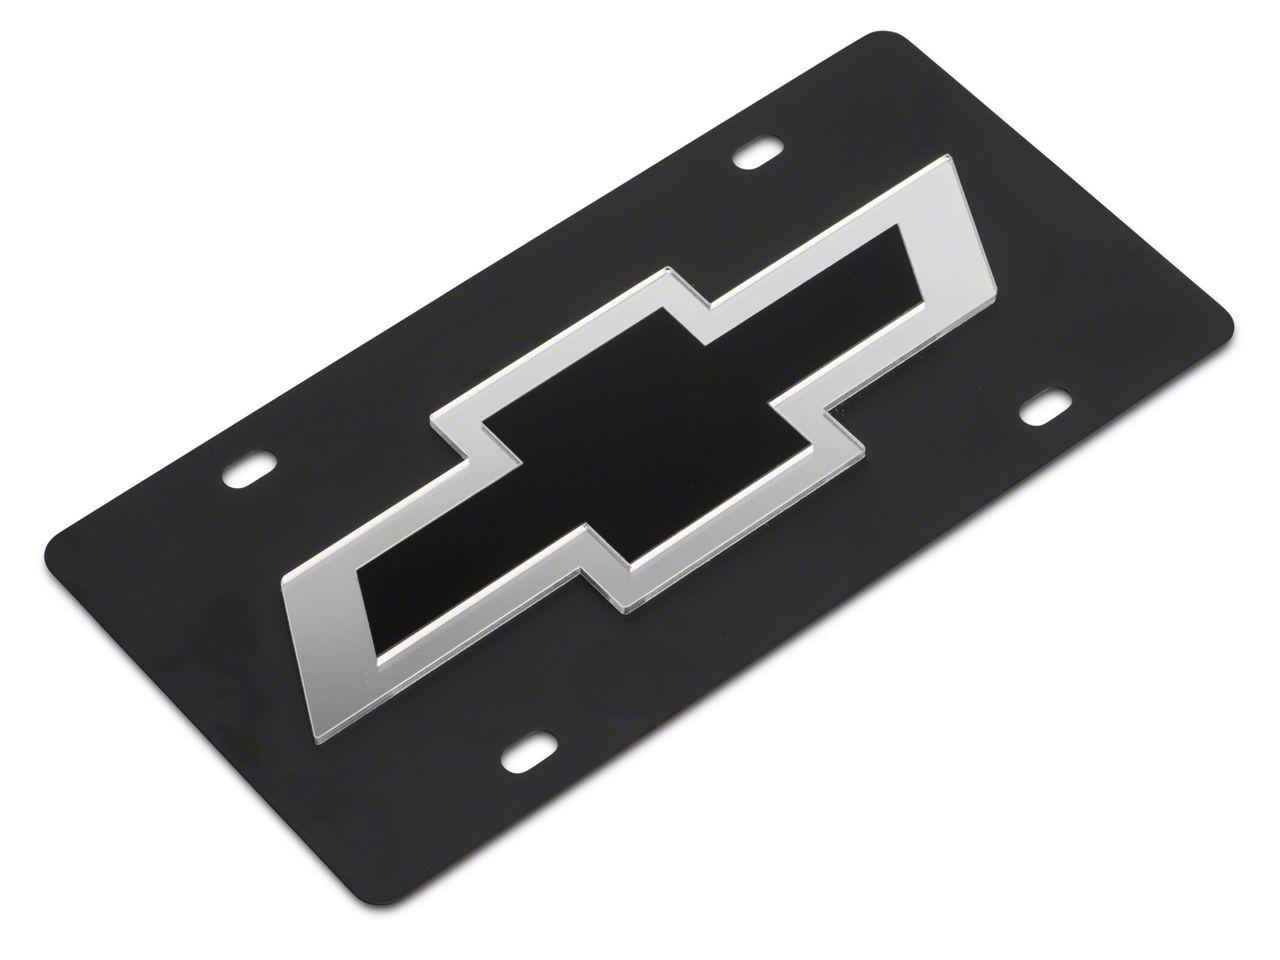 SpeedForm Carbon Steel License Plate w/ Black Bowtie Logo (99-18 Silverado 1500)